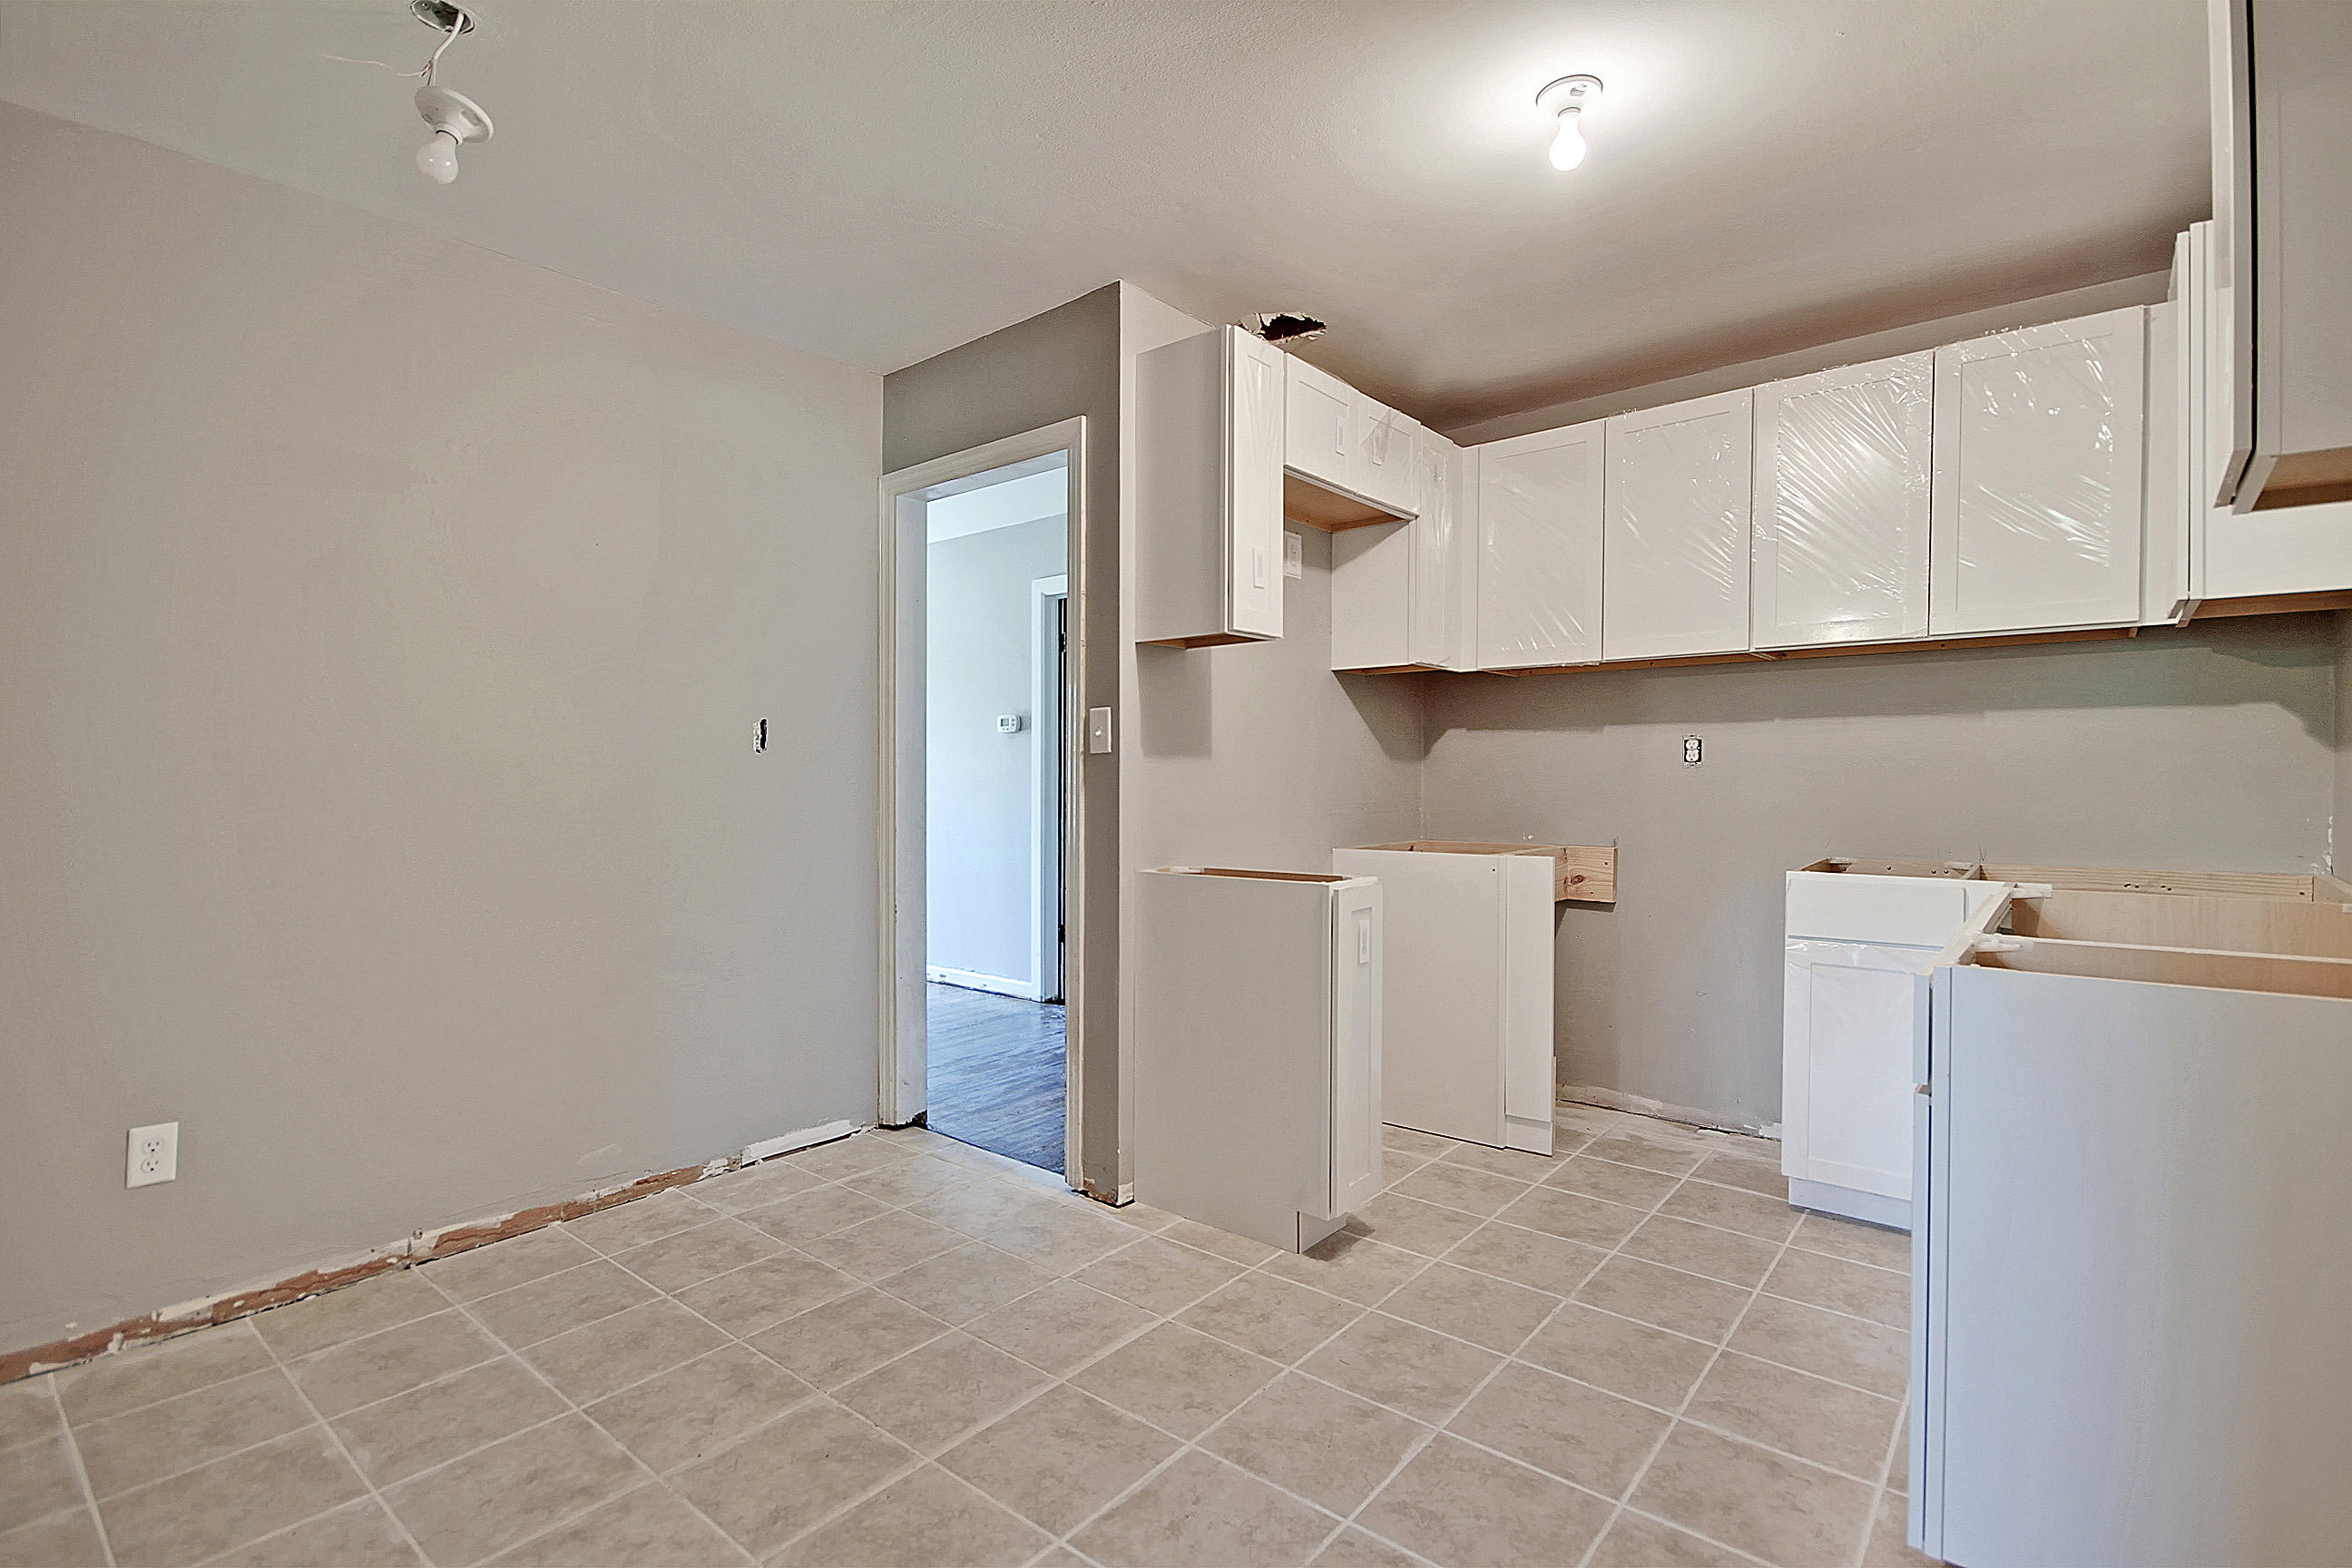 Northbridge Terrace Homes For Sale - 1094 Northbridge, Charleston, SC - 8